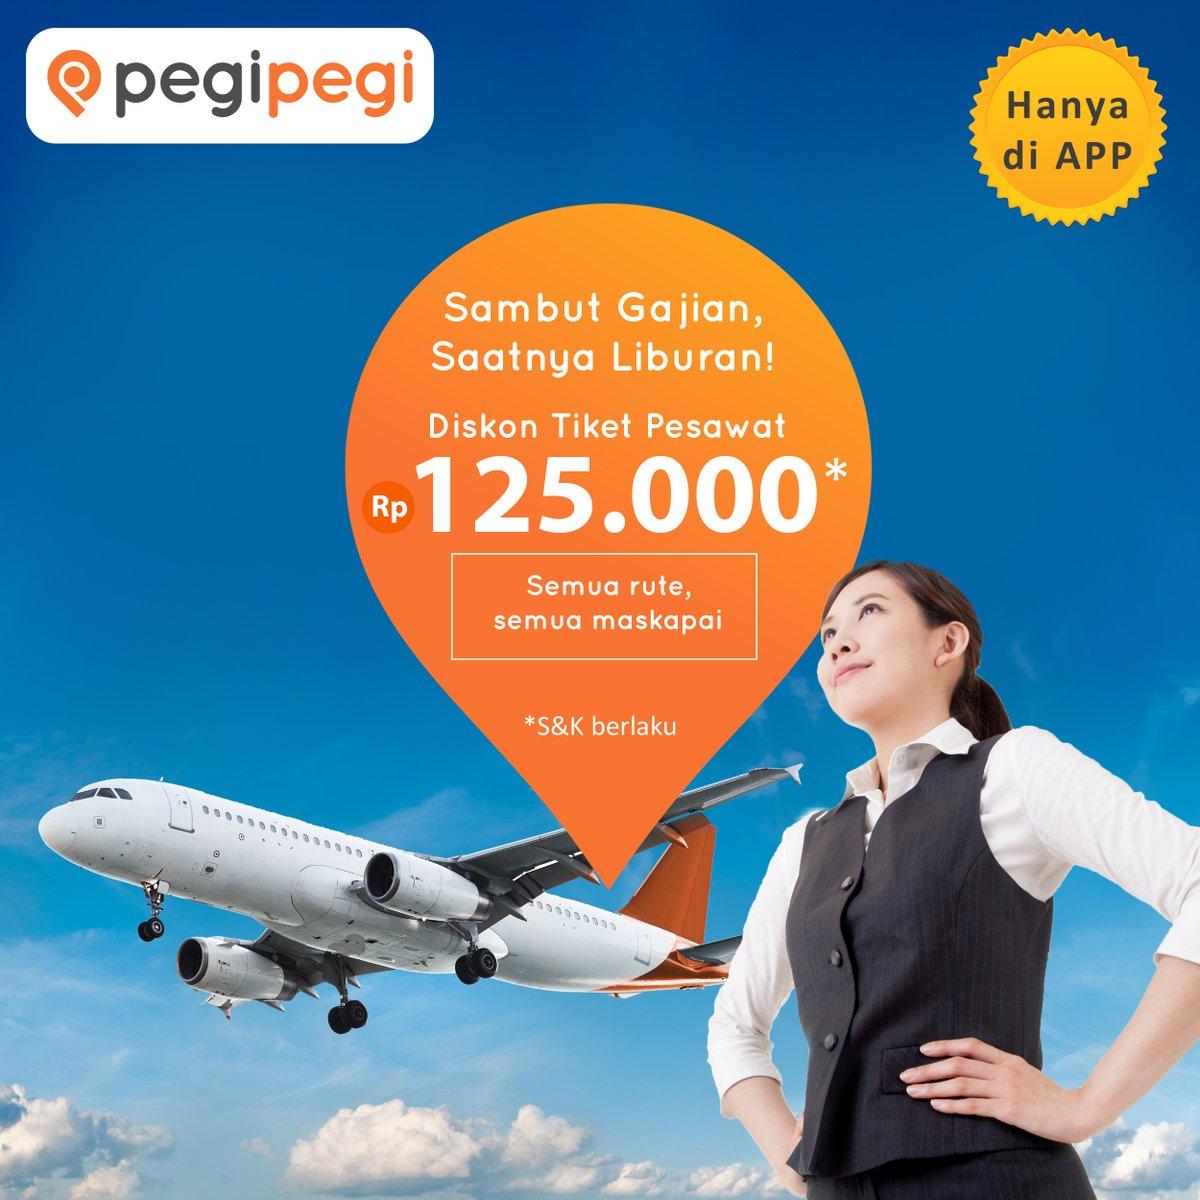 PegiPegi - Promo Gajian Diskon Tiket Pesawat s.d 125 Ribu (s.d 5 Okt 2018)